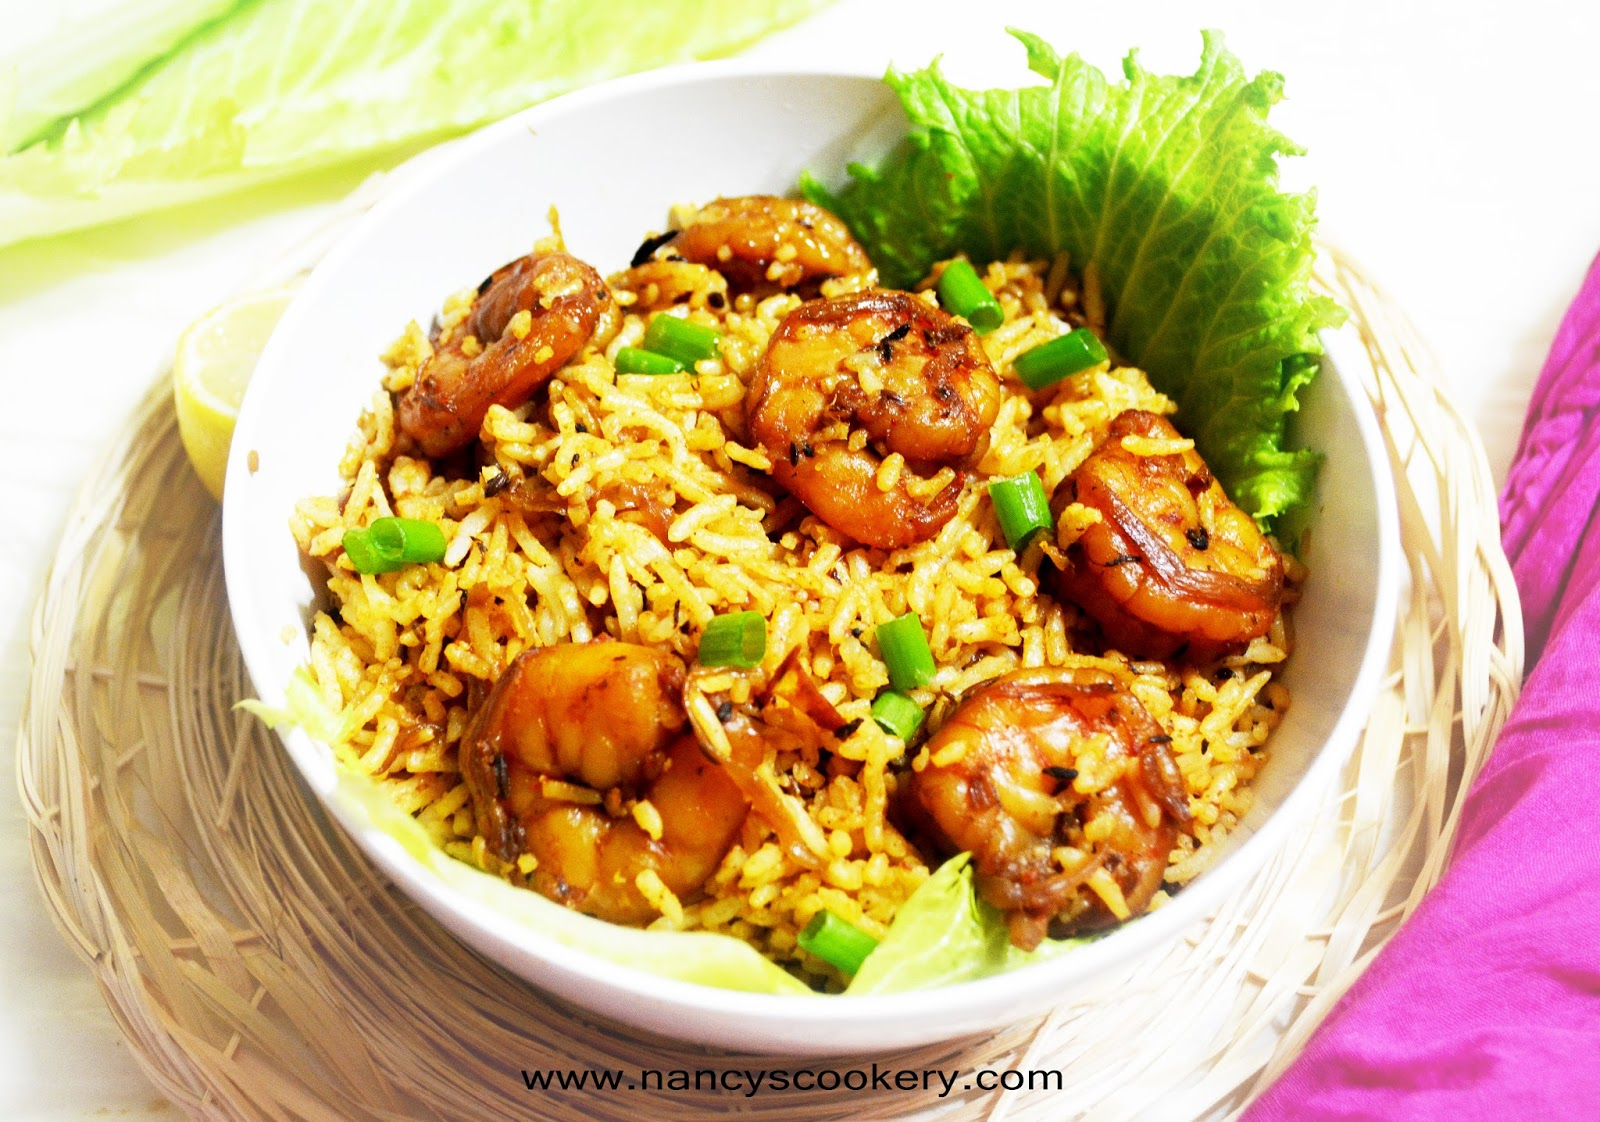 Shrimp/Prawn Rice Recipe | Nancy's Cookery